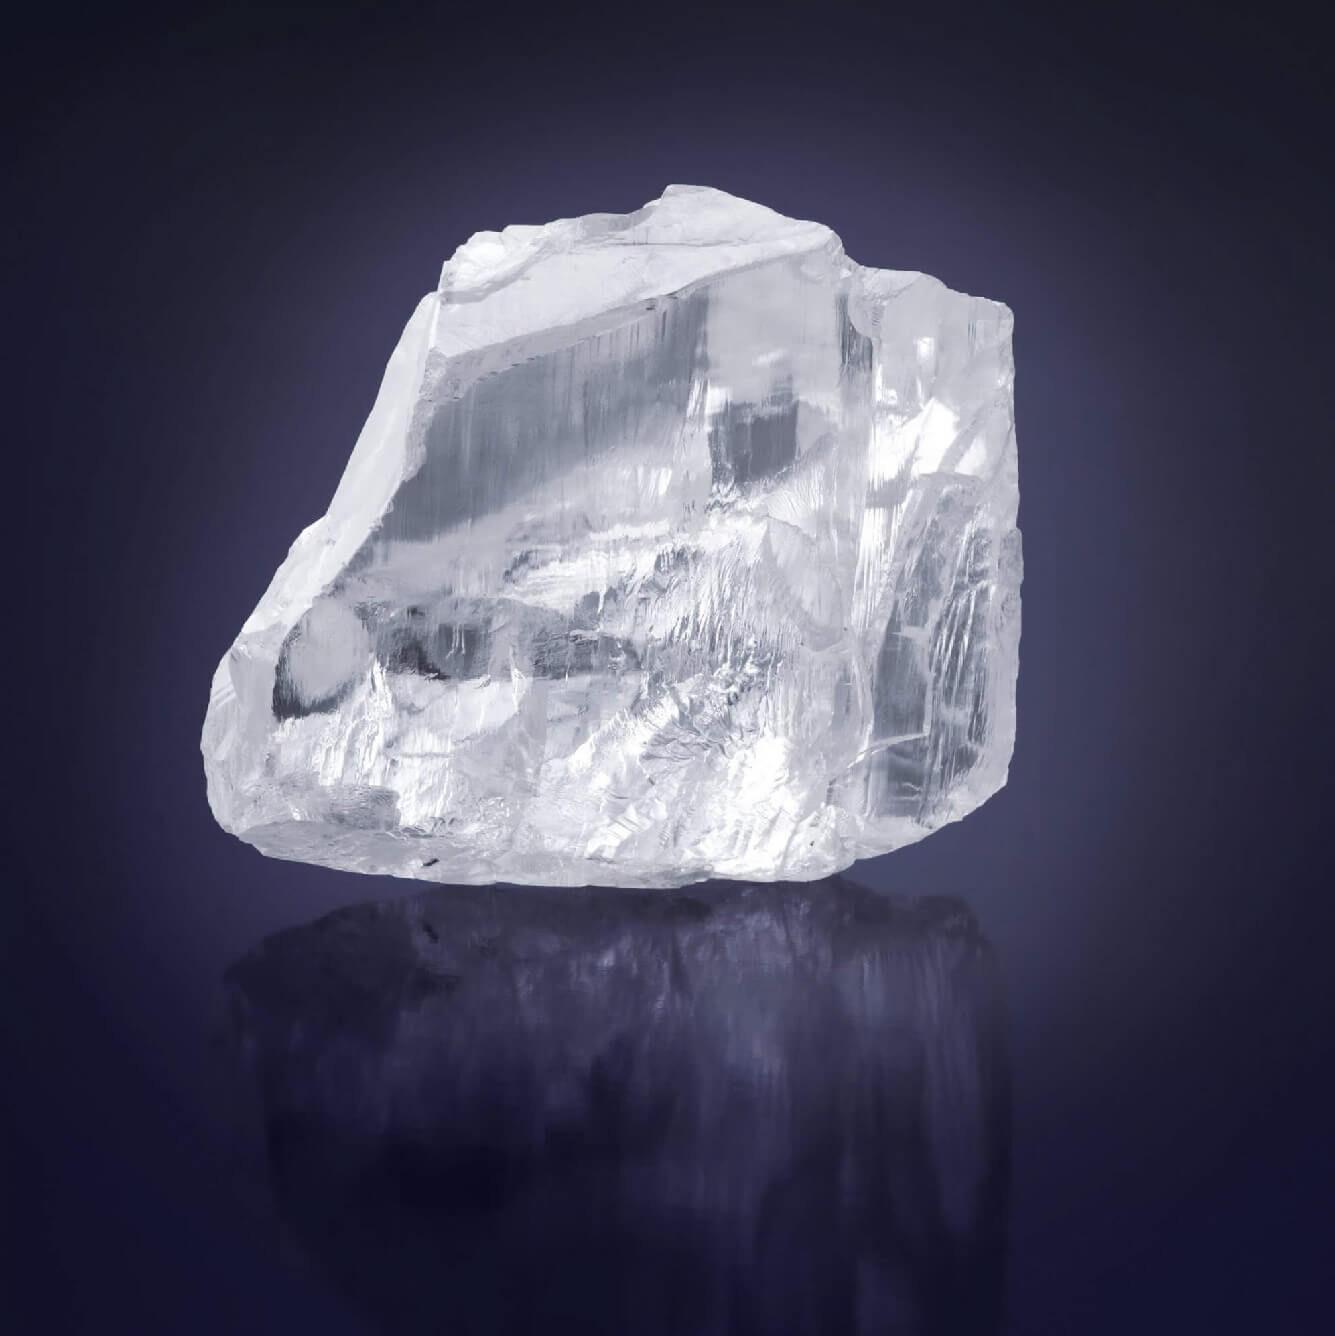 The Graff Meya Prosperity rough diamond and a model